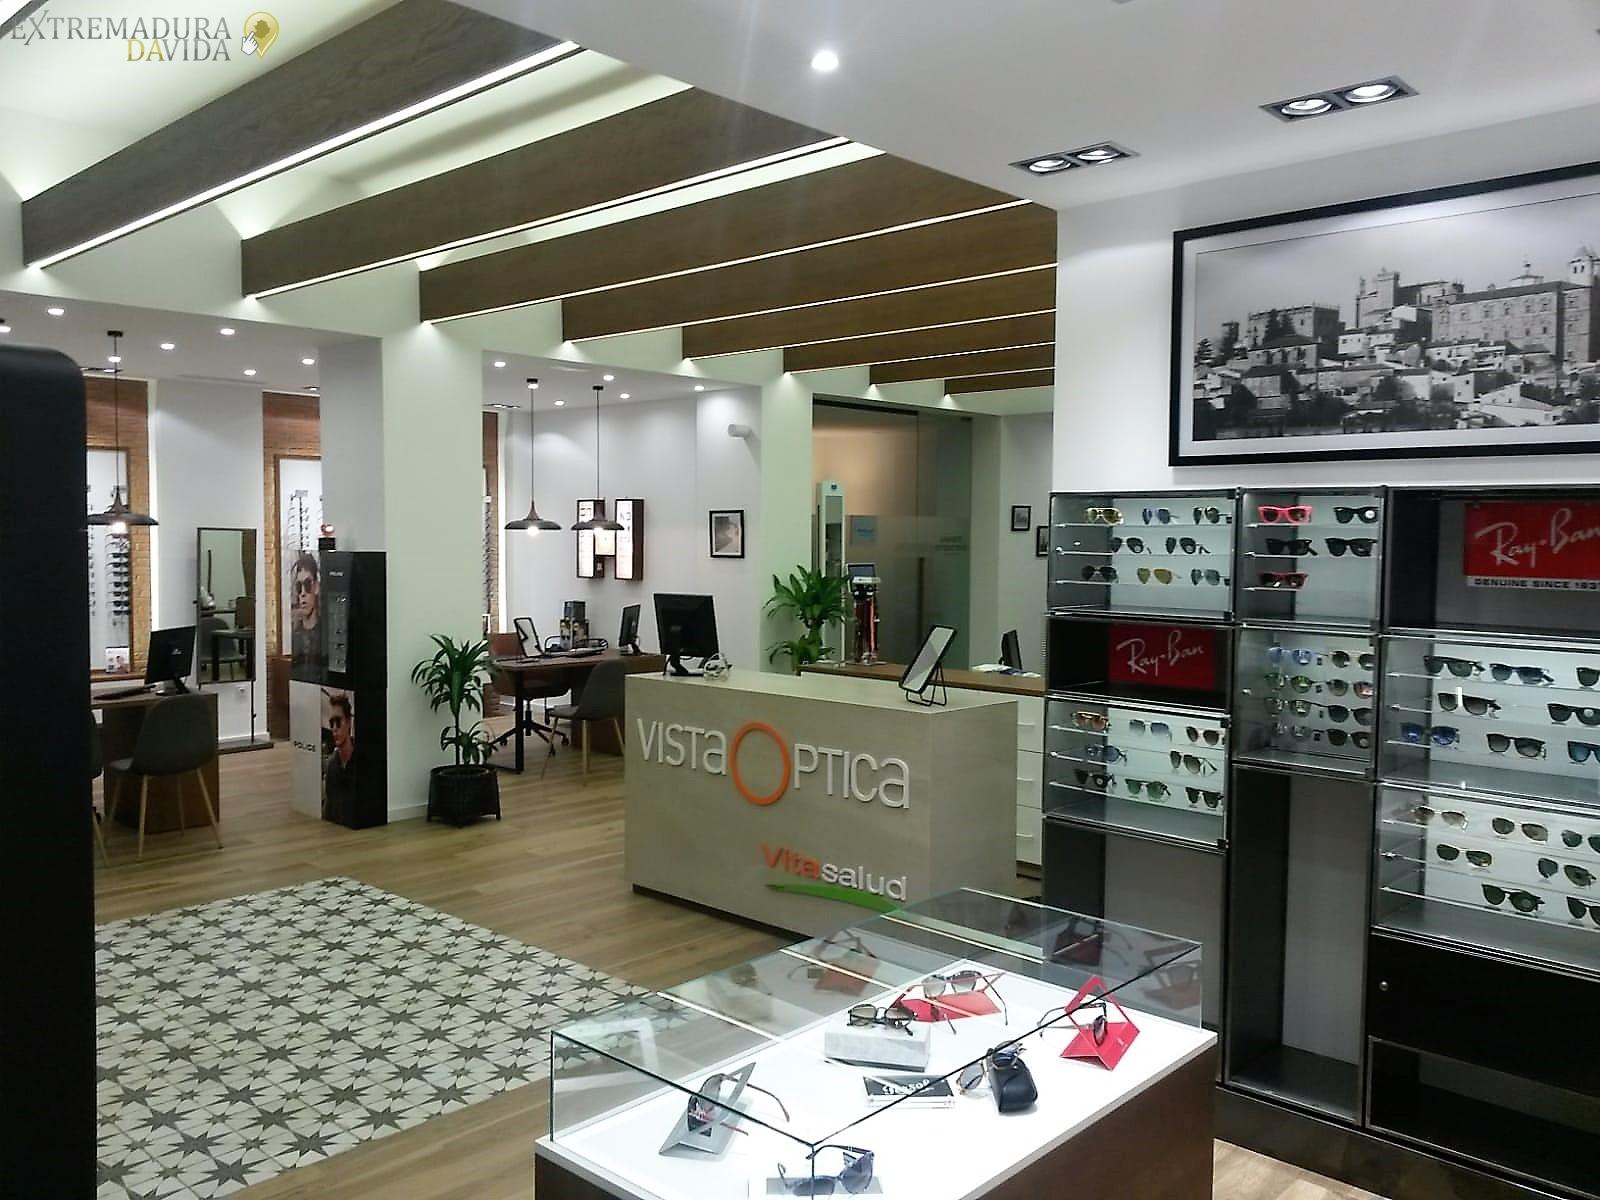 Óptica Audifonos en Cáceres Vista Optica